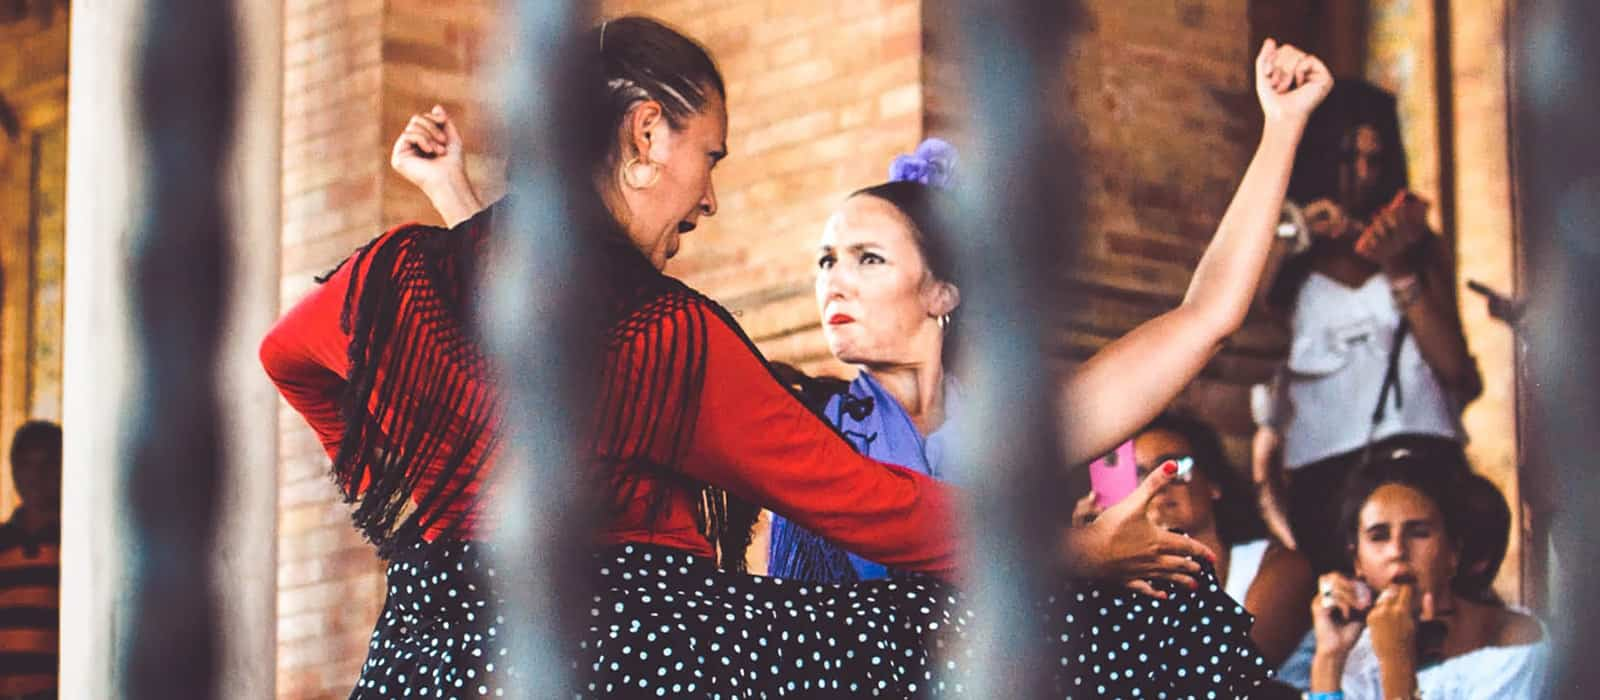 Traditional Spain dance